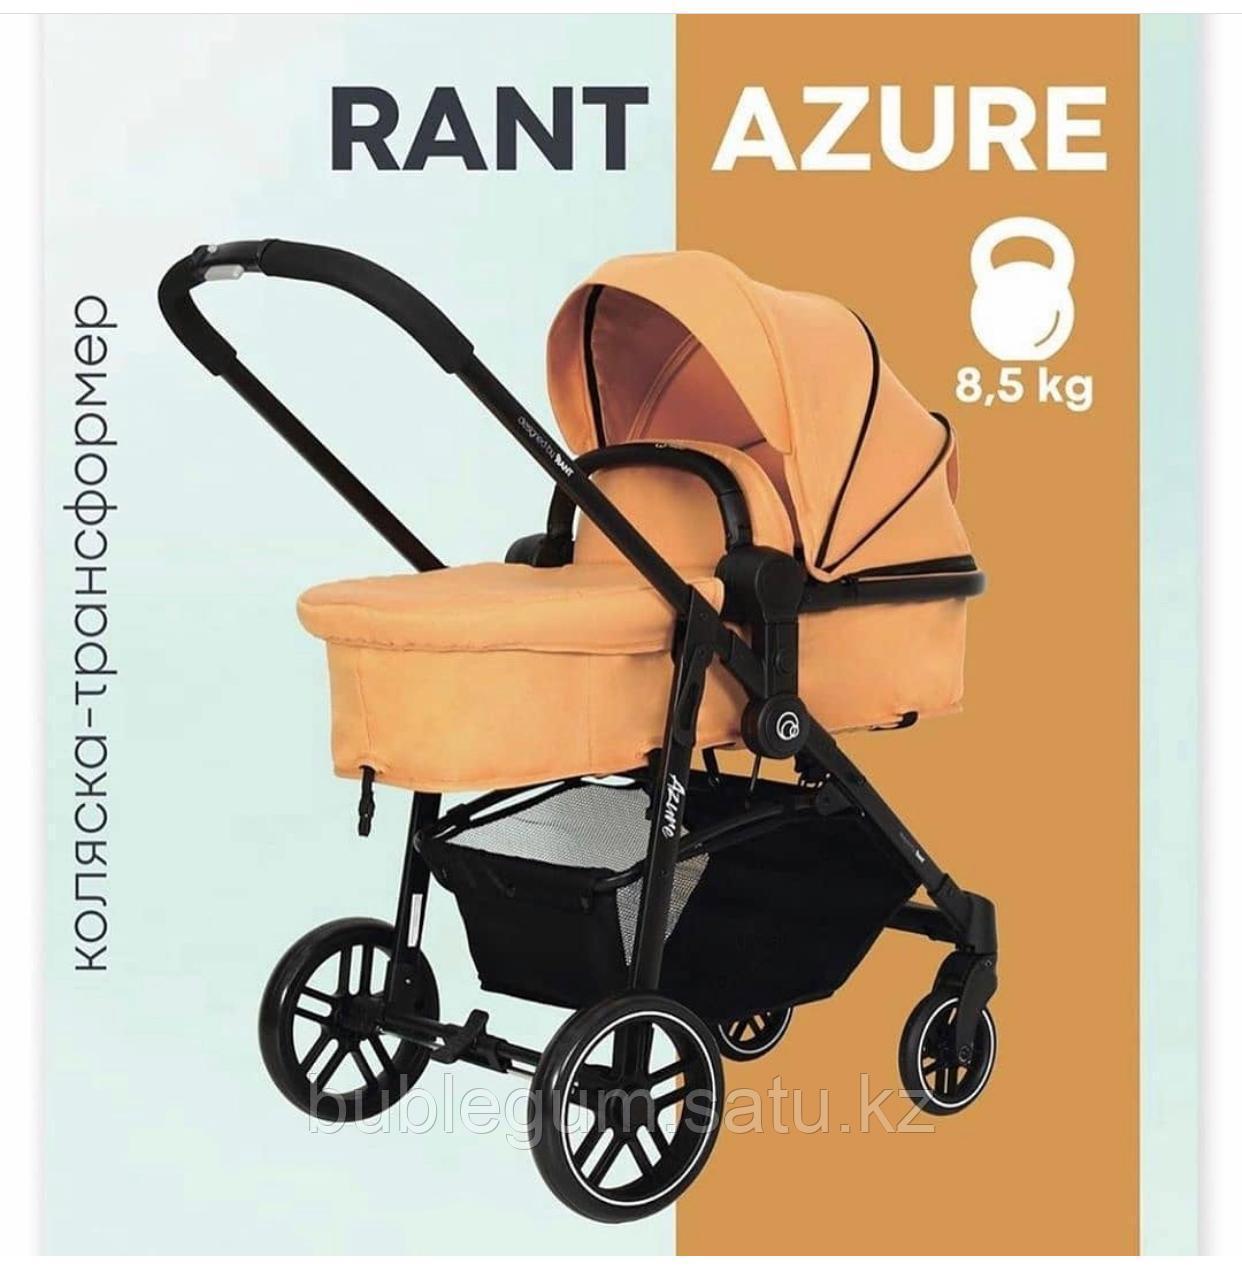 Коляска трансформер 2 в 1 Rant Azure (рант Азур)